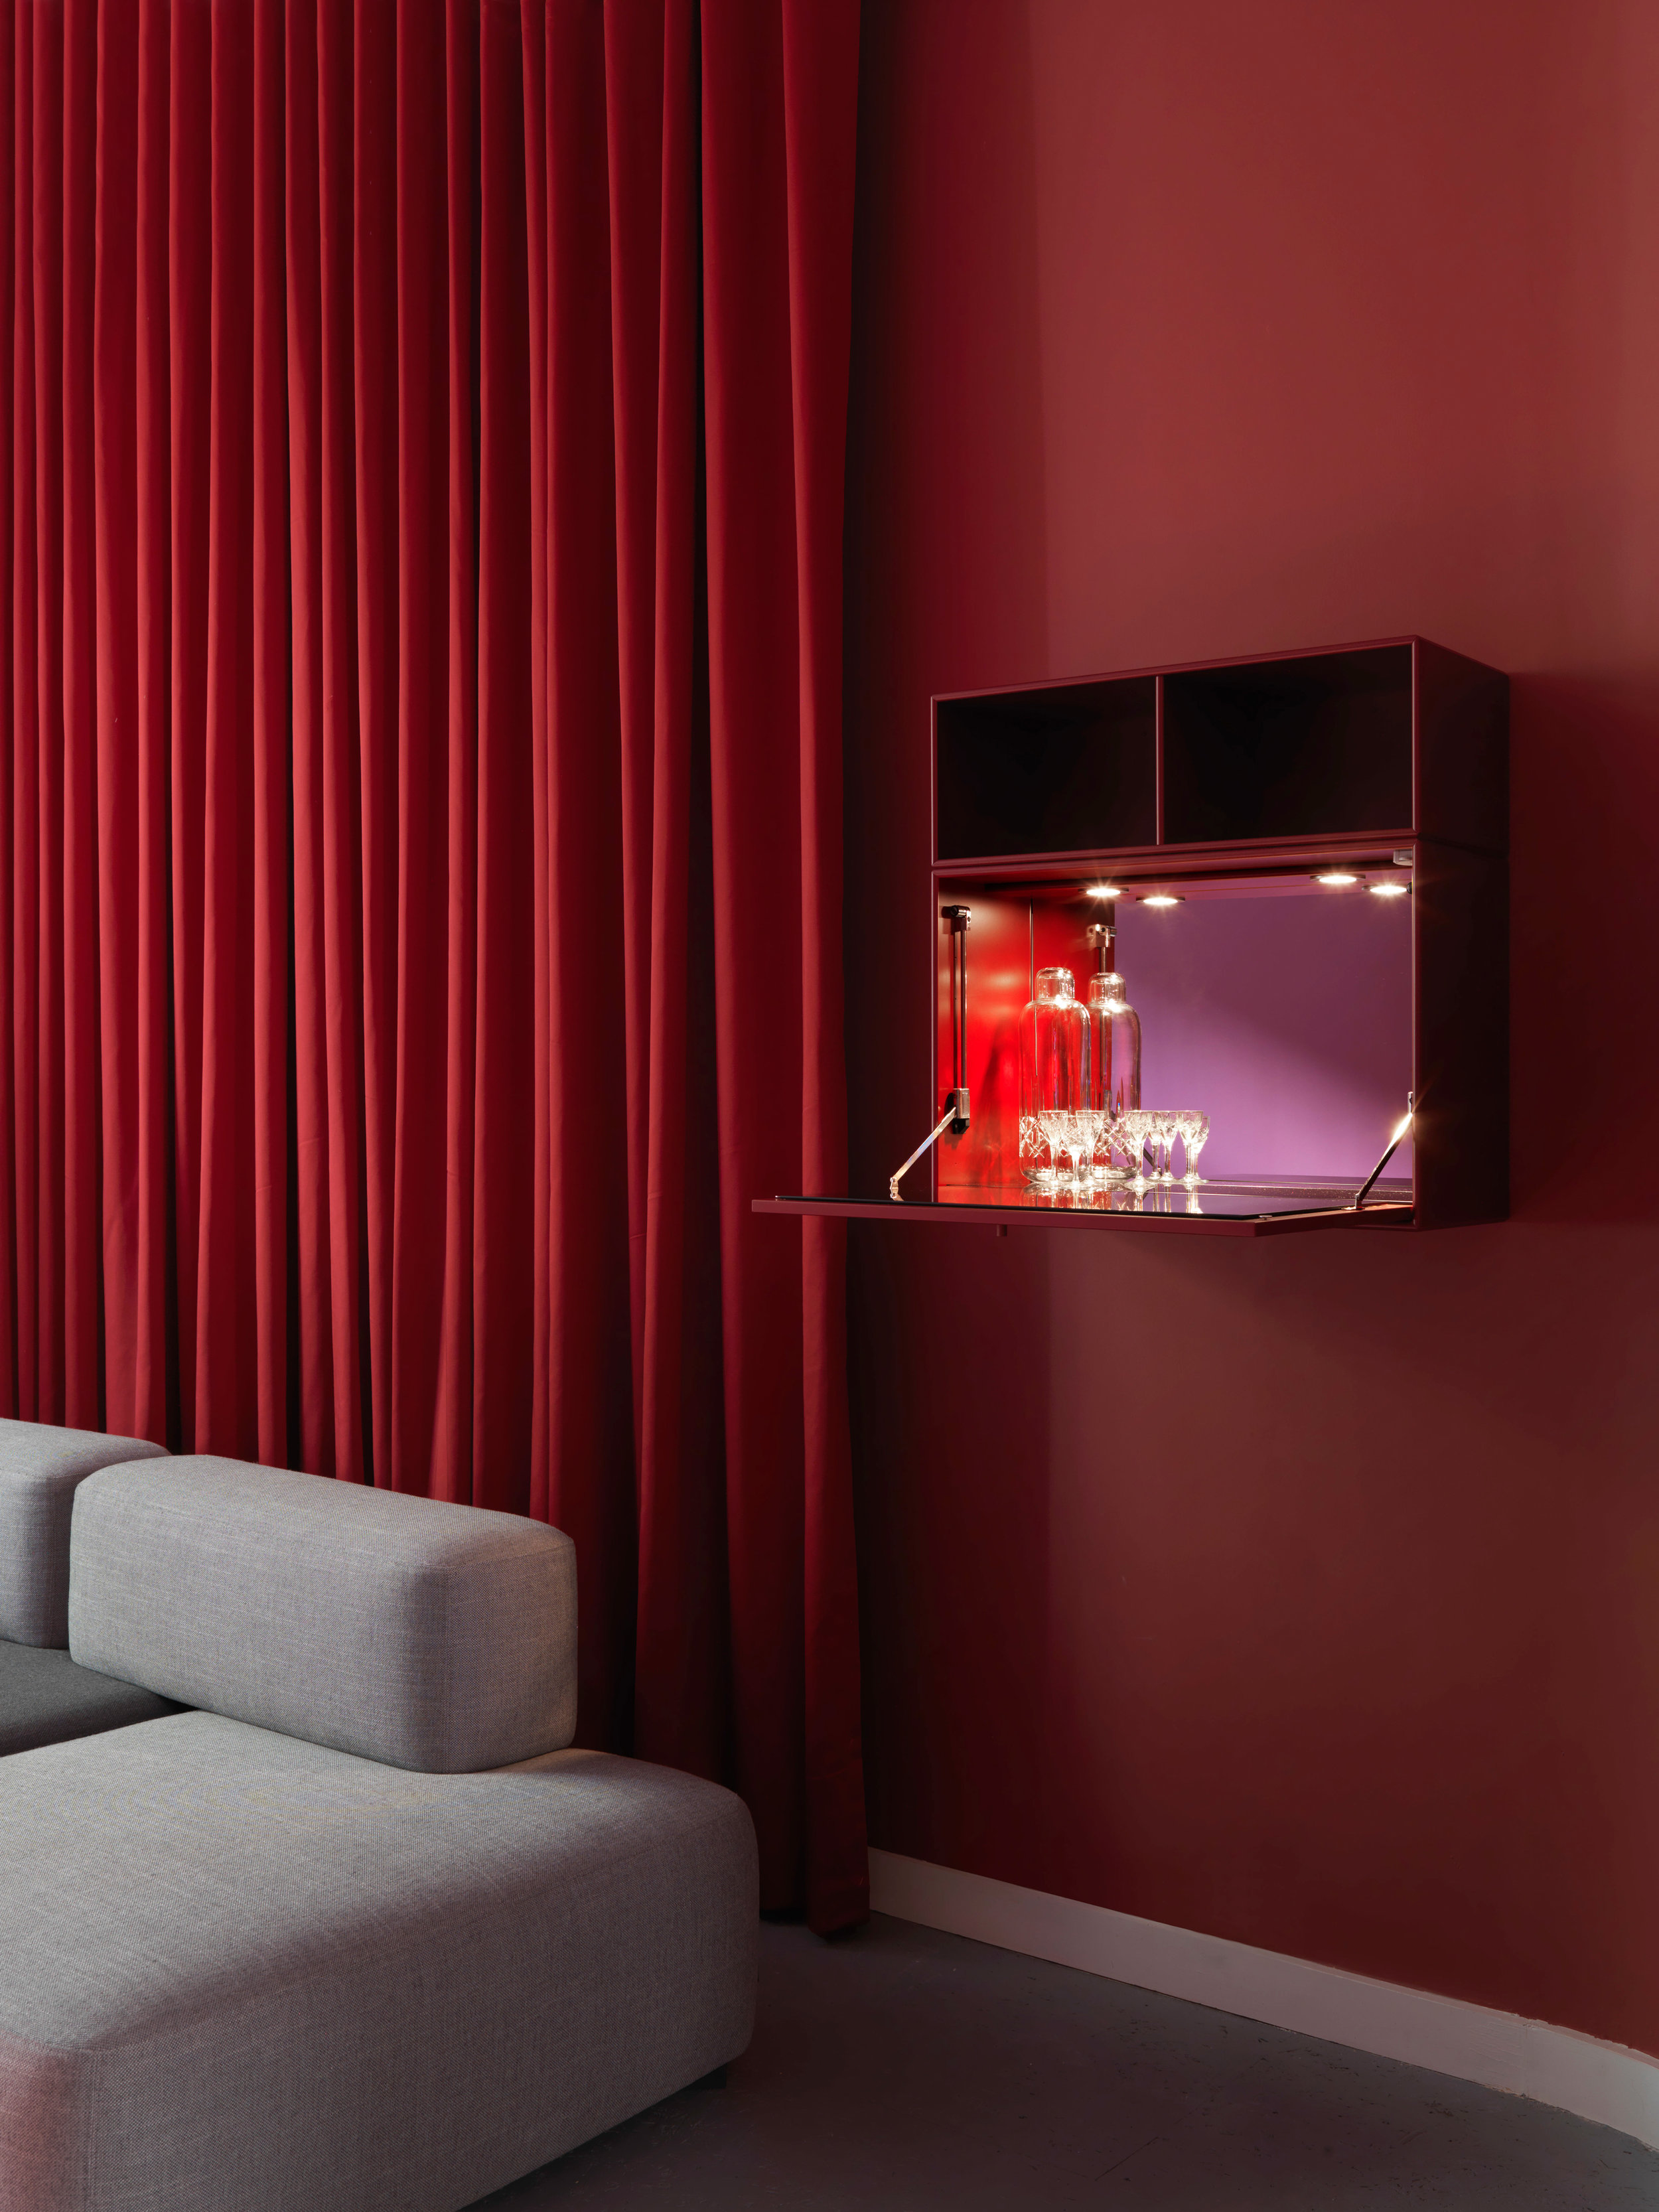 Montana-designers-Storage-and-shelving-systems-London-Design-Week-home-interior-Scandinavian-design-Scandinavian-home-MoulinRouge-Detail.jpg